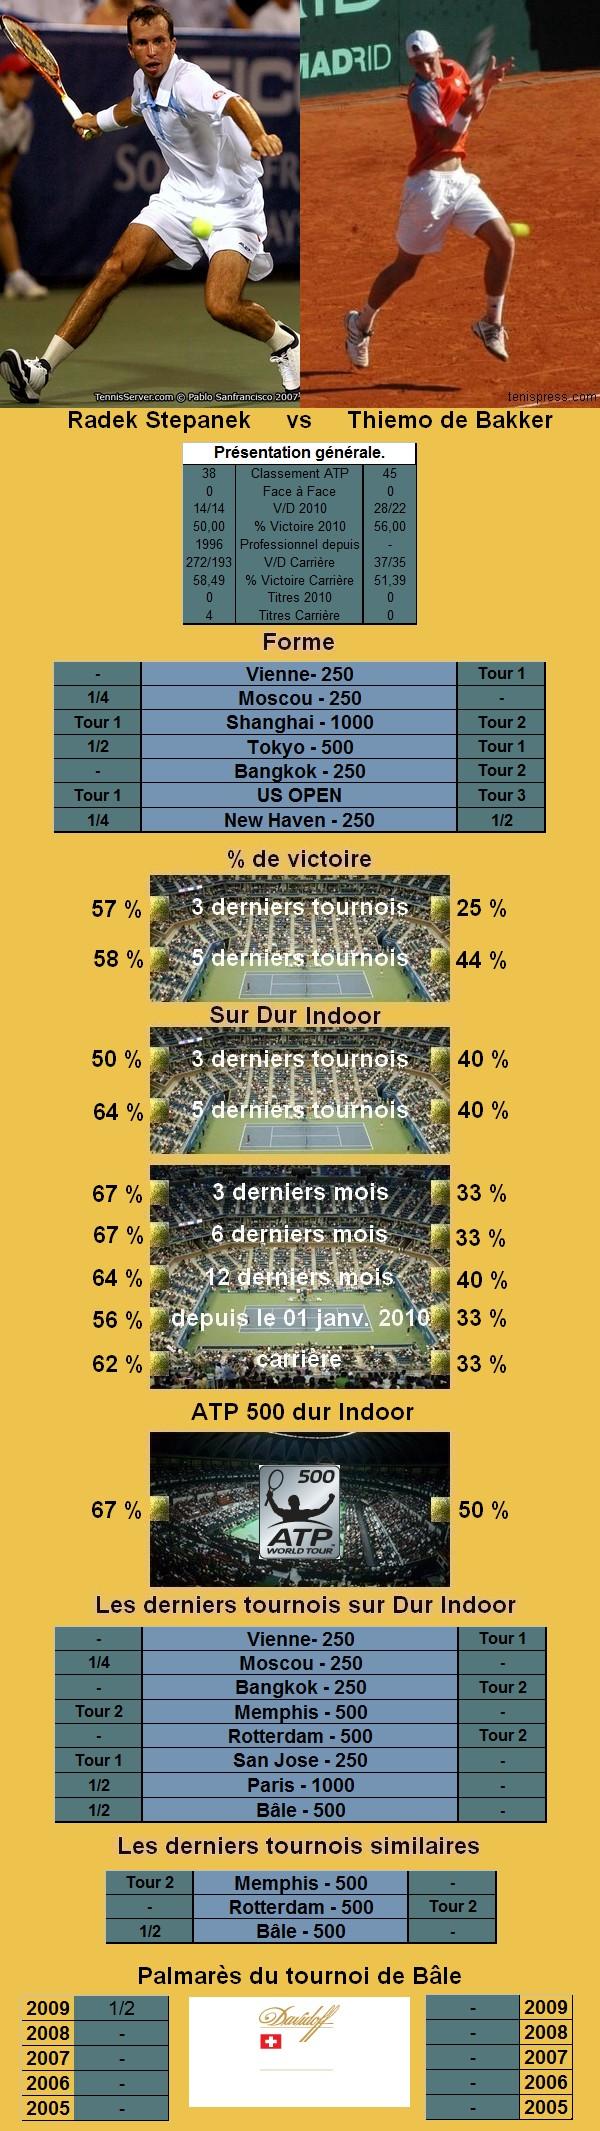 Statistiques tennis de Stepanek contre de Bakker à Bale